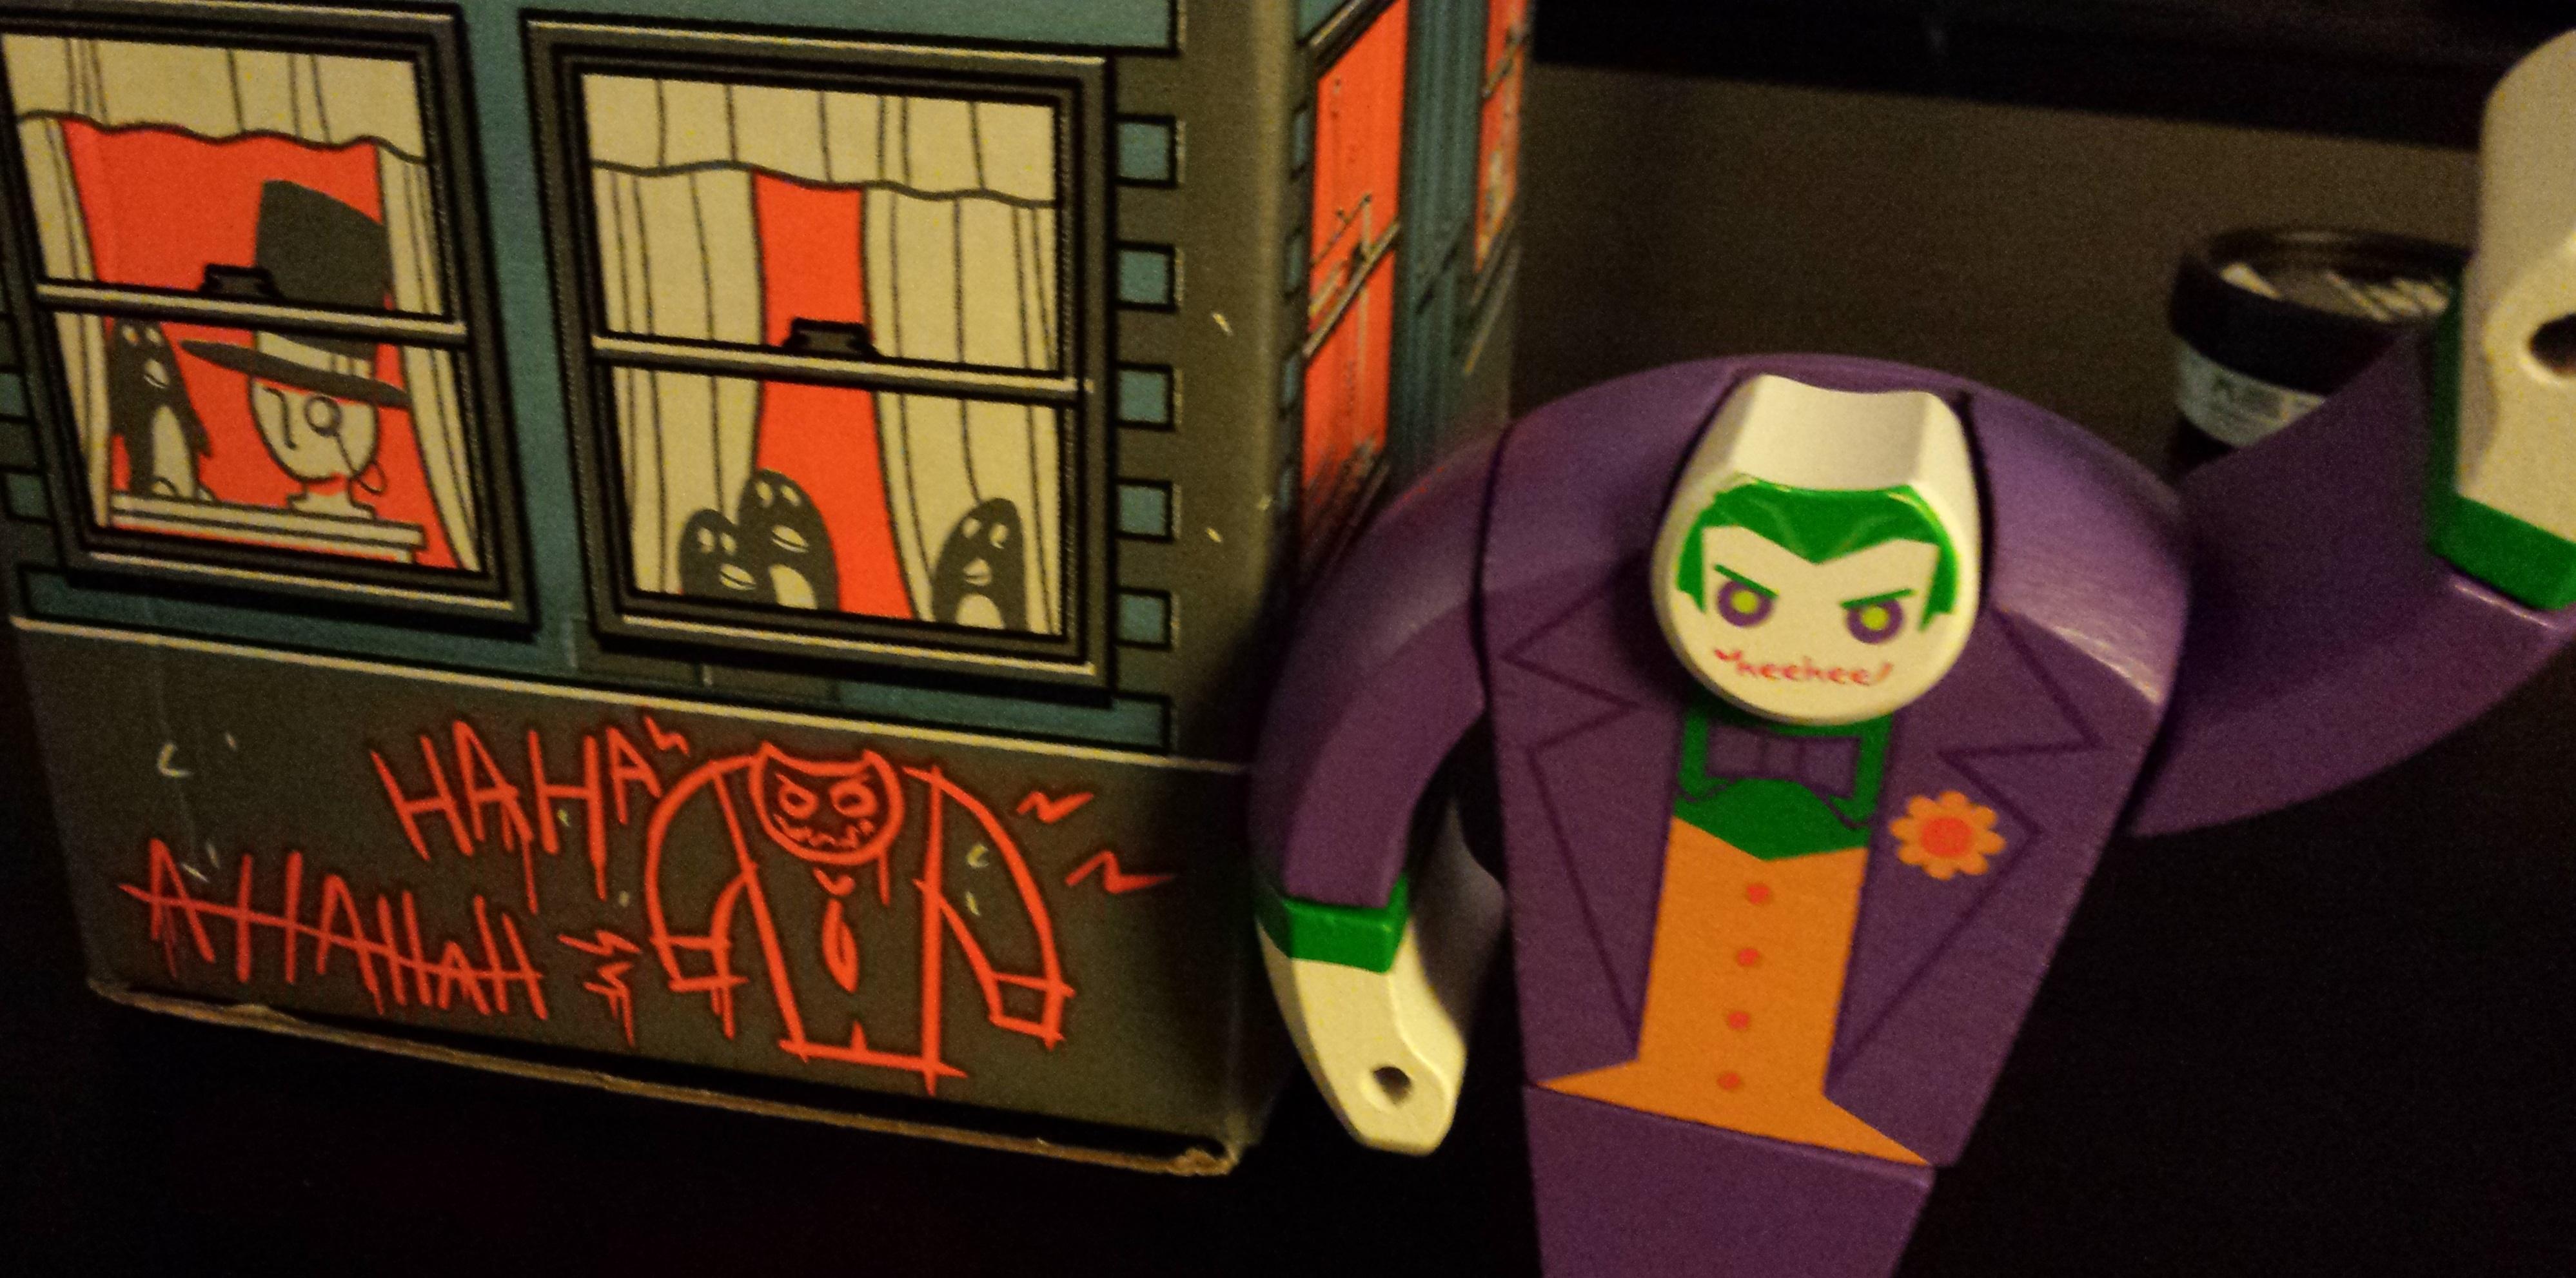 August's loot crate, joker toy